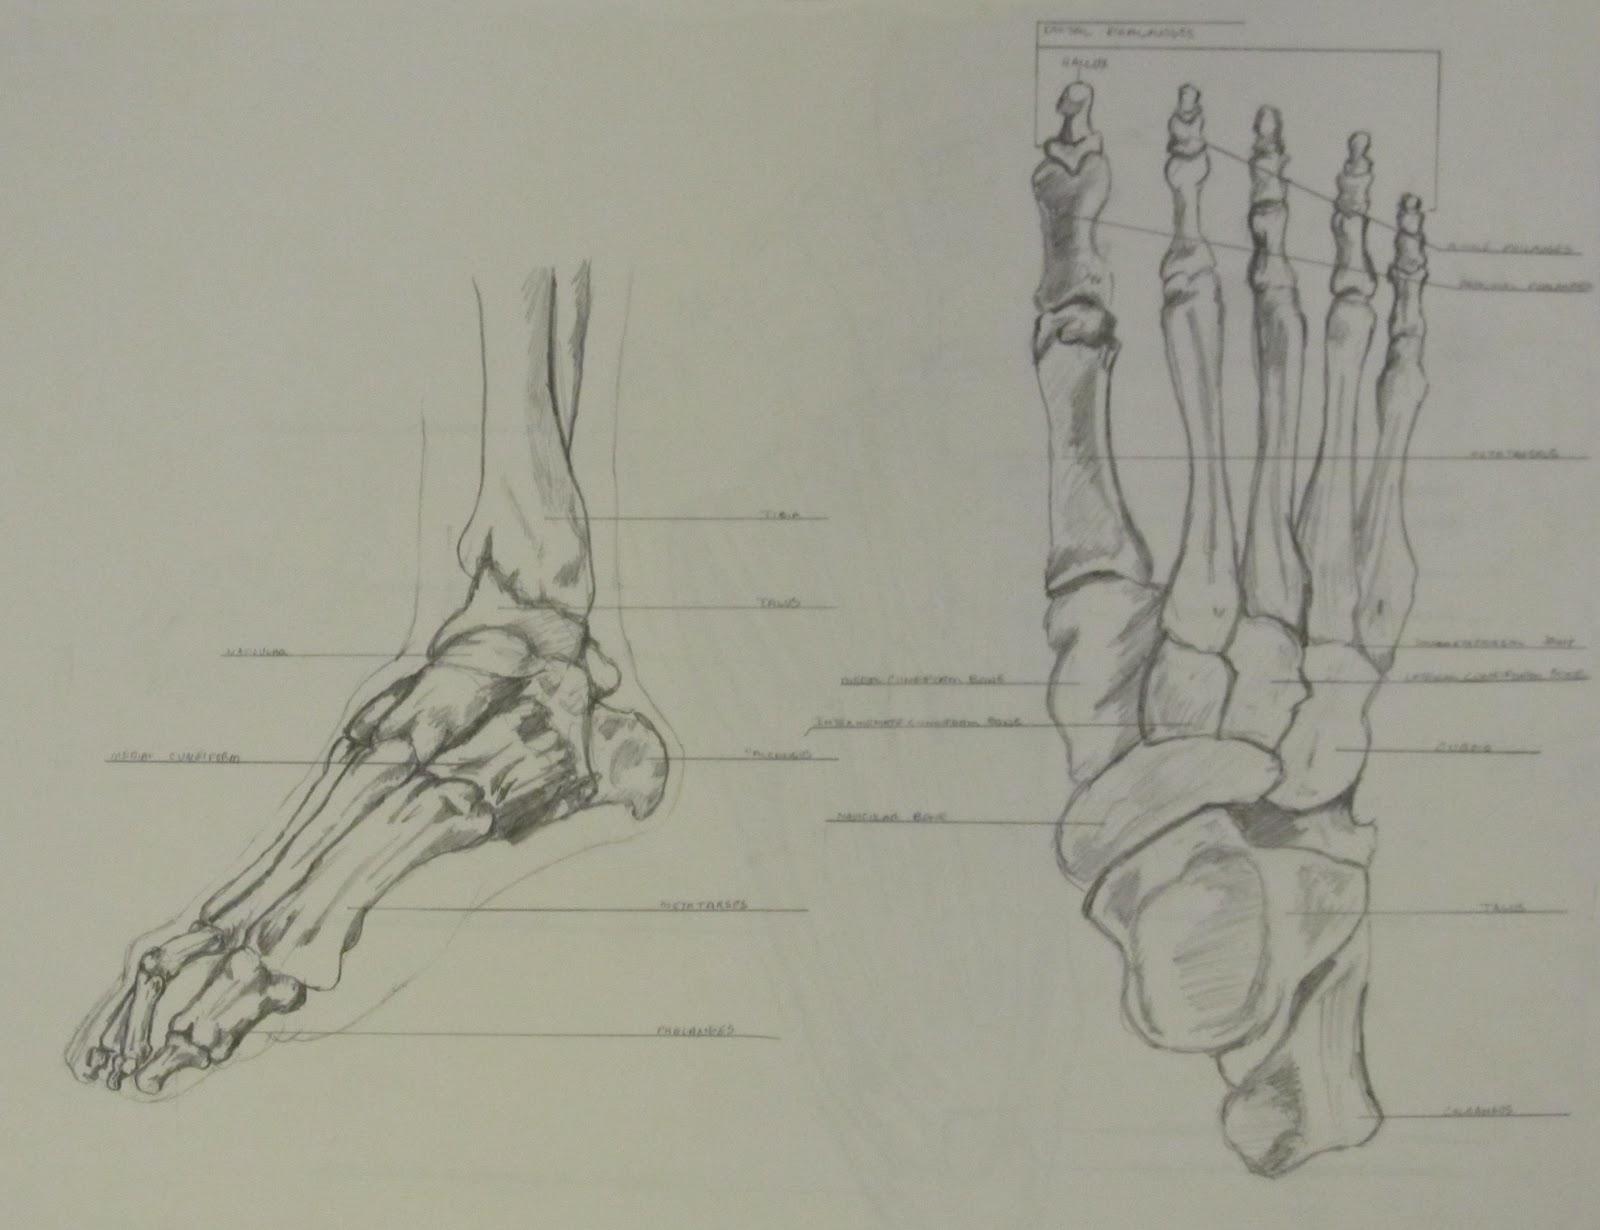 Cartoon Of Green Human Arm And Hand Bones - Royalty Free Vector ...